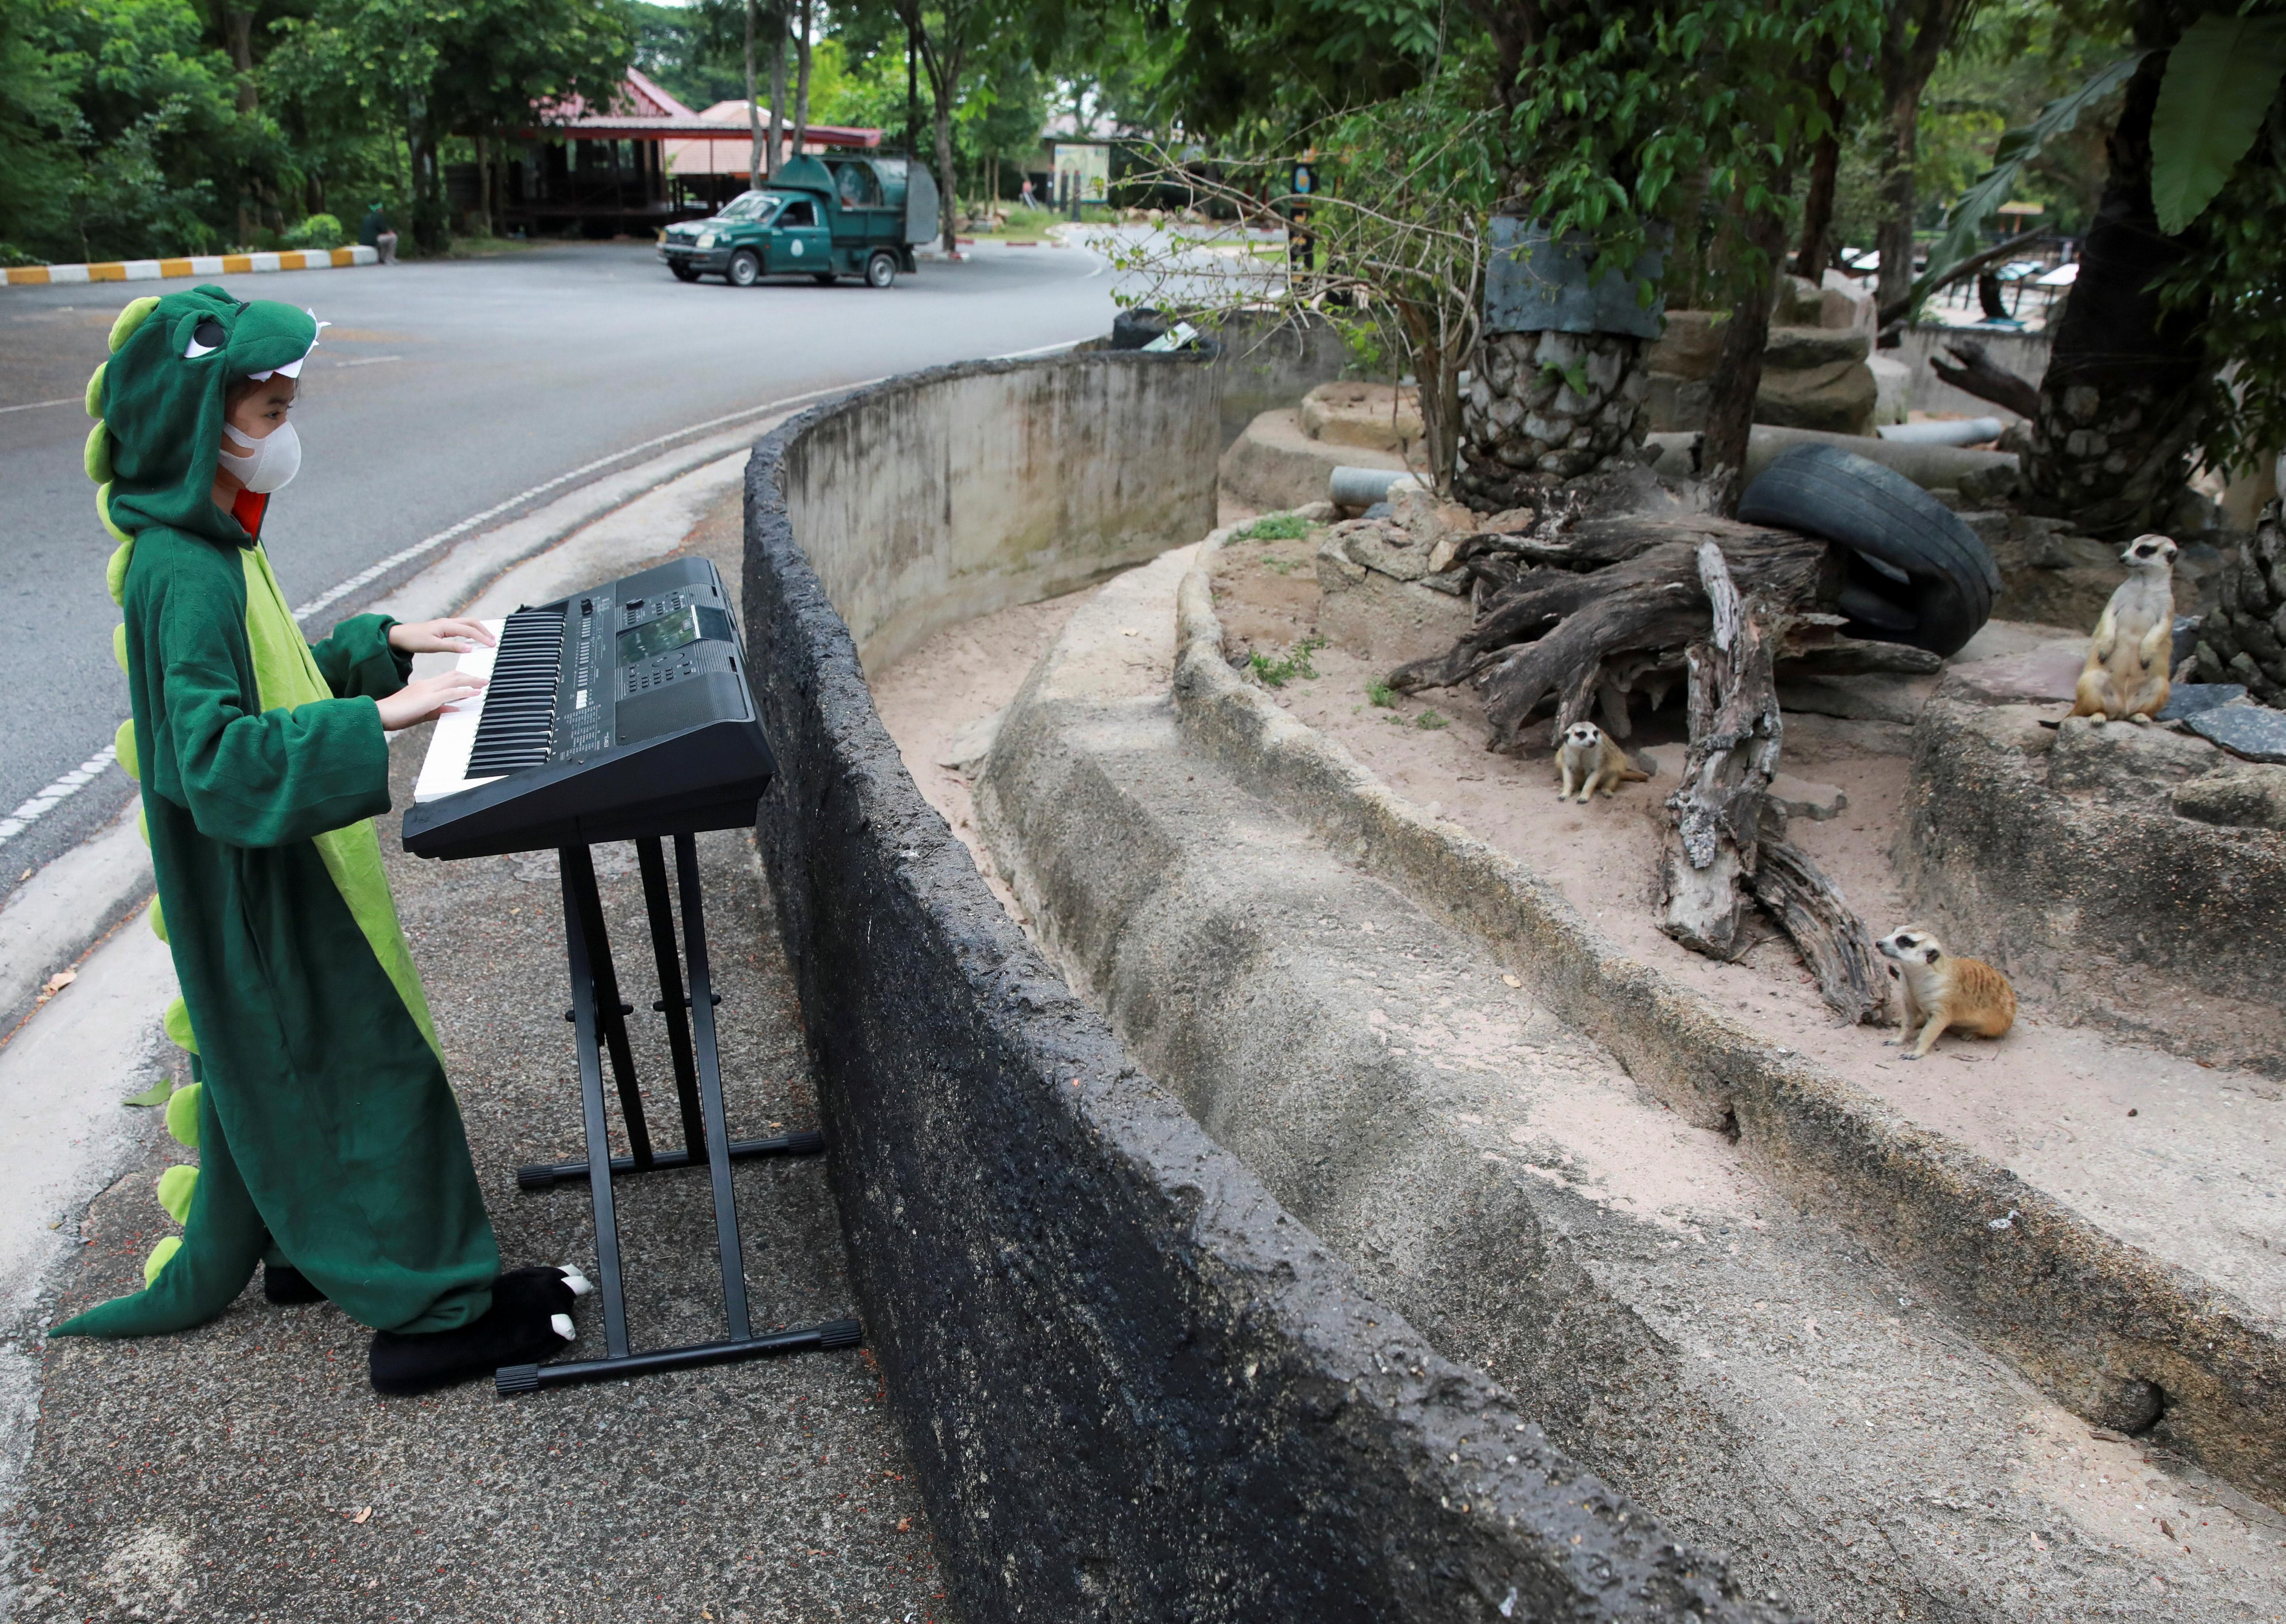 Meerkats are seen as Seenlada Supat, 11, plays keyboard for animals amid the coronavirus disease (COVID-19) outbreak, at a zoo in Chonburi, Thailand May 26, 2021. REUTERS/Soe Zeya Tun